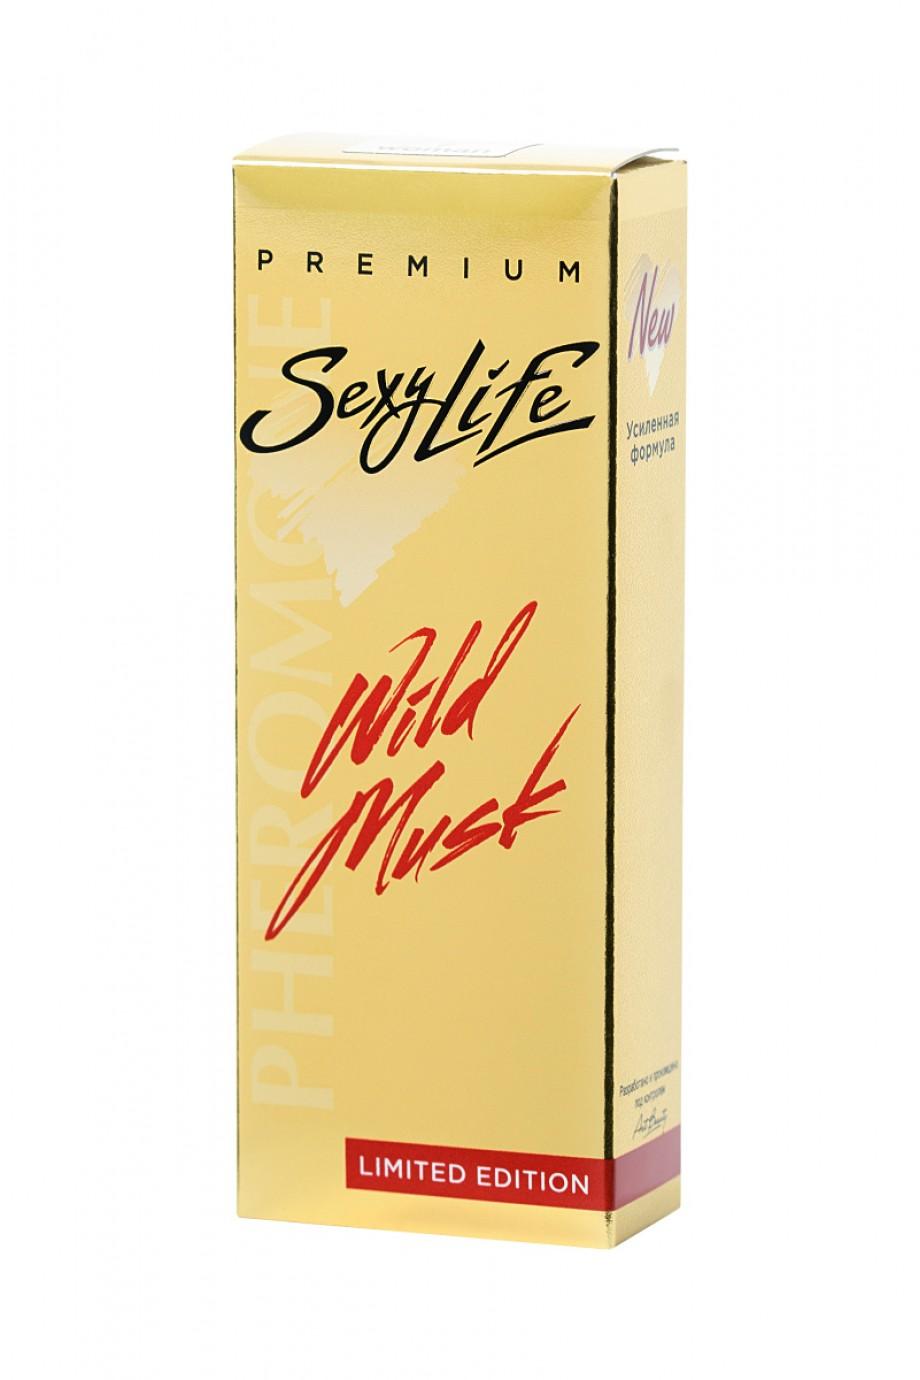 Духи с феромонами Wild Musk №3 философия аромата Sublime Balkiss, женские, 10 мл